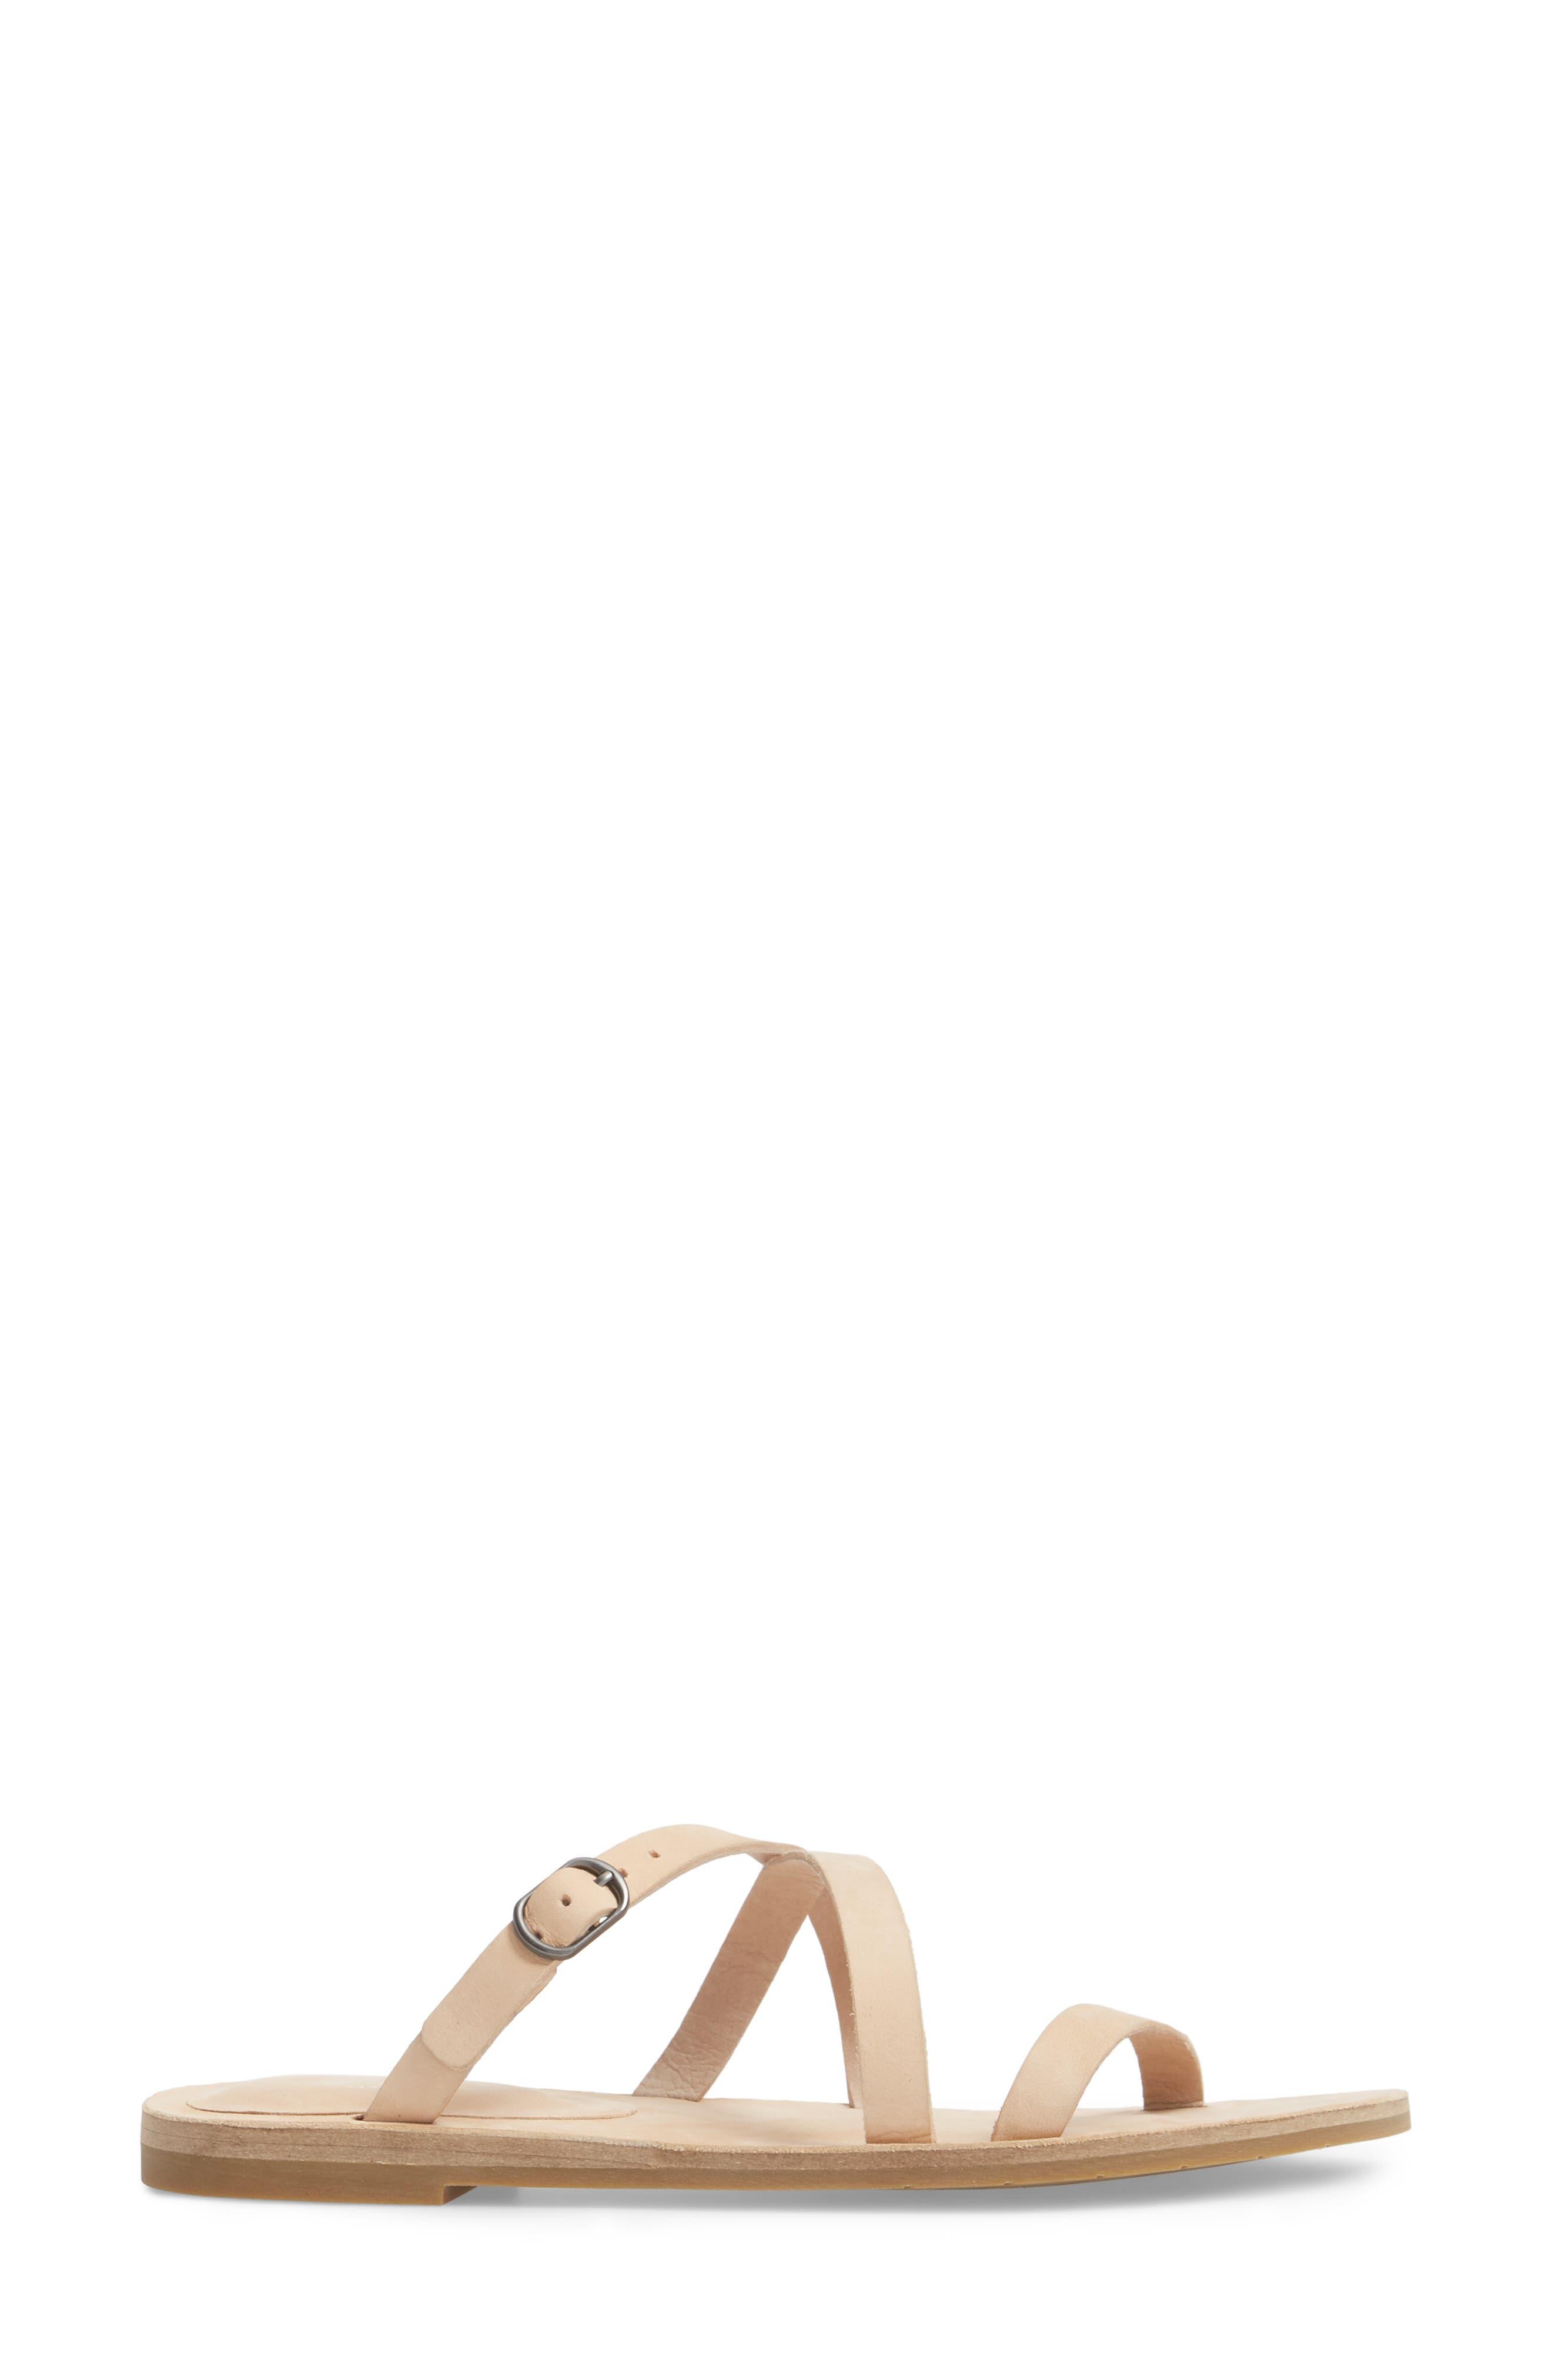 Dali Strappy Slide Sandal,                             Alternate thumbnail 3, color,                             Cream Nubuck